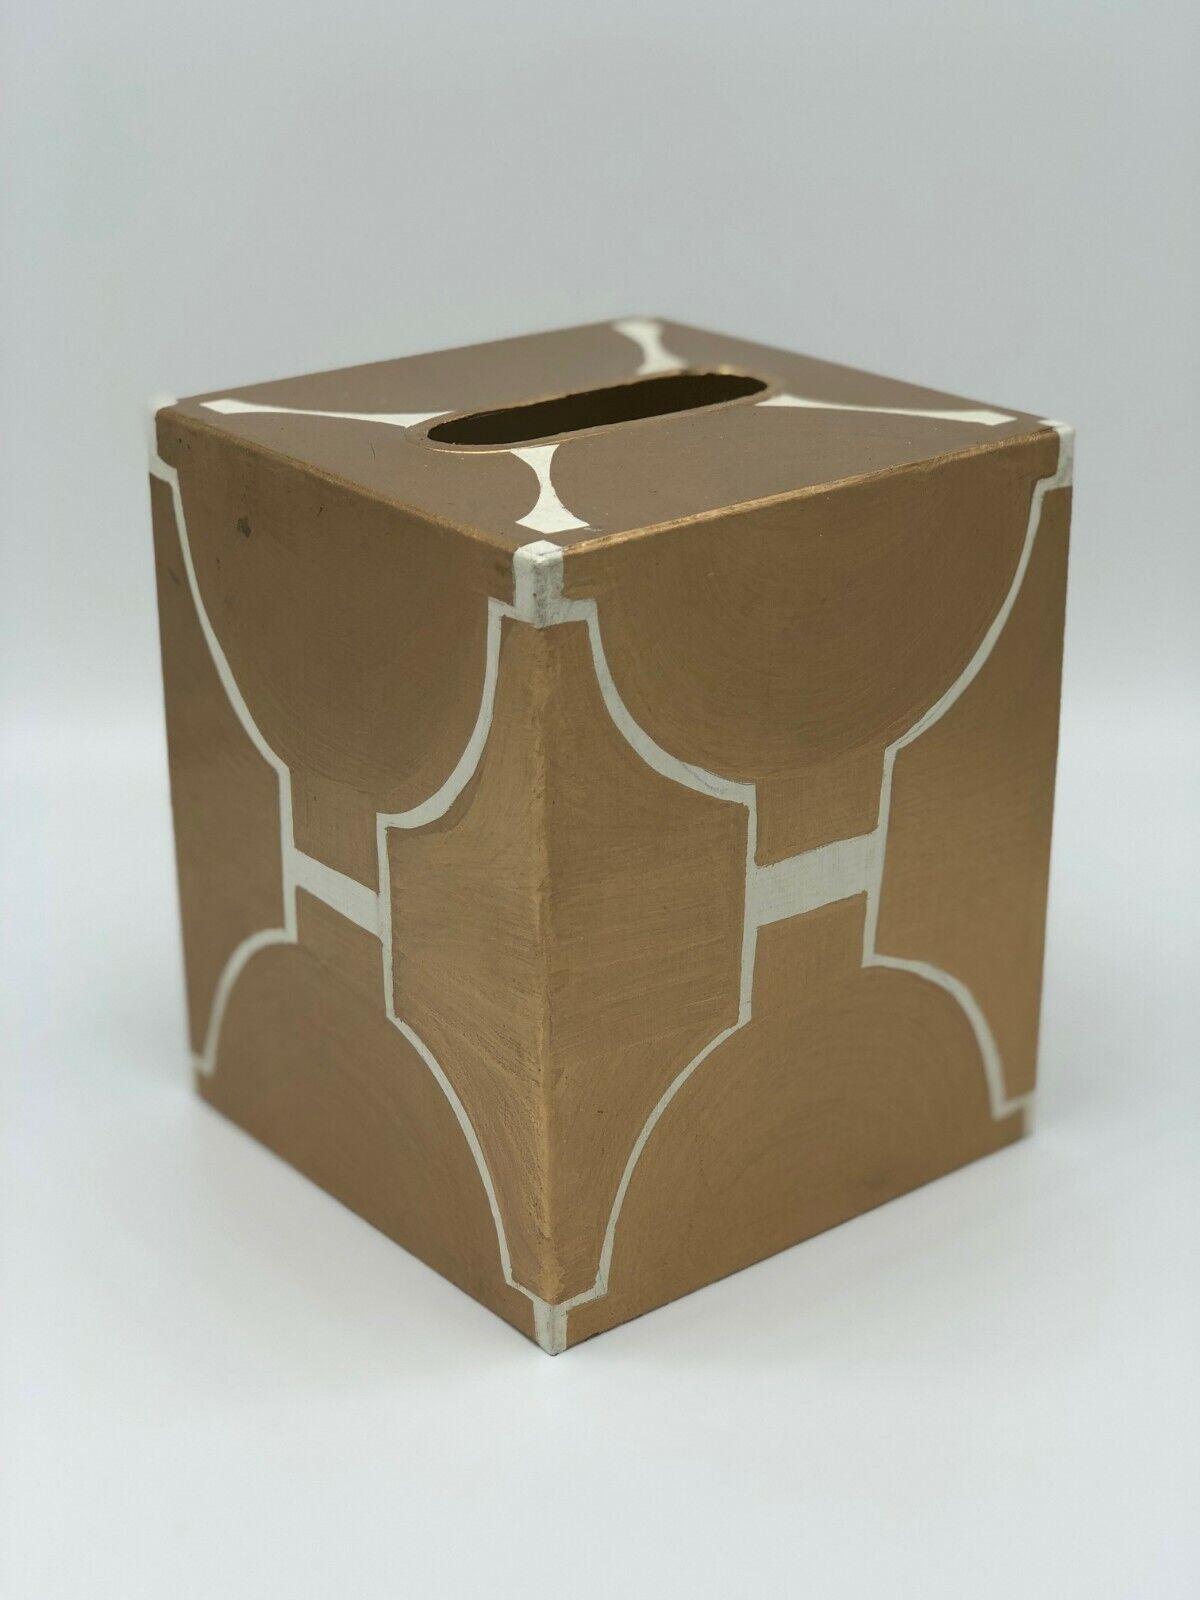 New Worlds Away Metal Tissue Box Startseite Gold and Cream